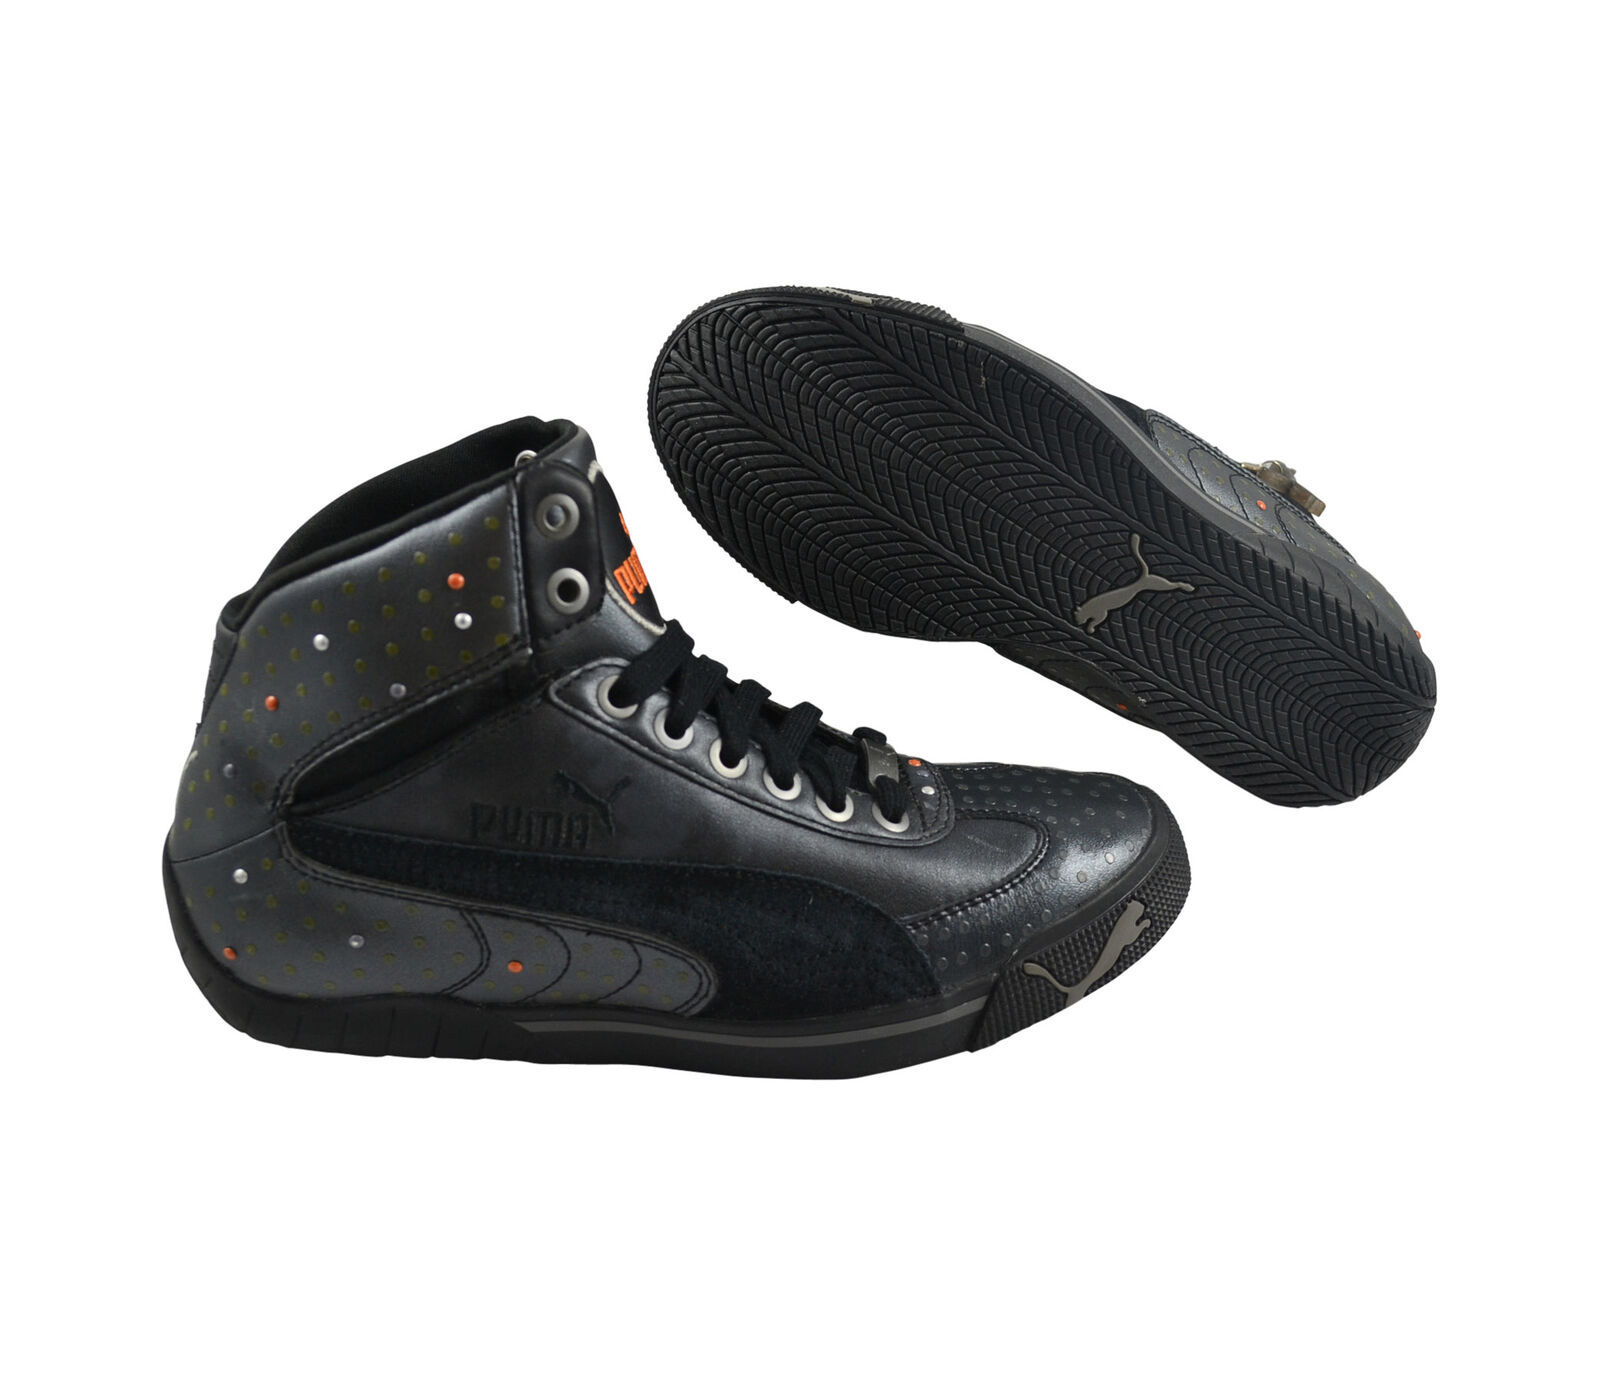 Puma Speed Cat 2.9 Charm Wn's Mid black/black/nectarine Schuhe/Sneaker 303275 03